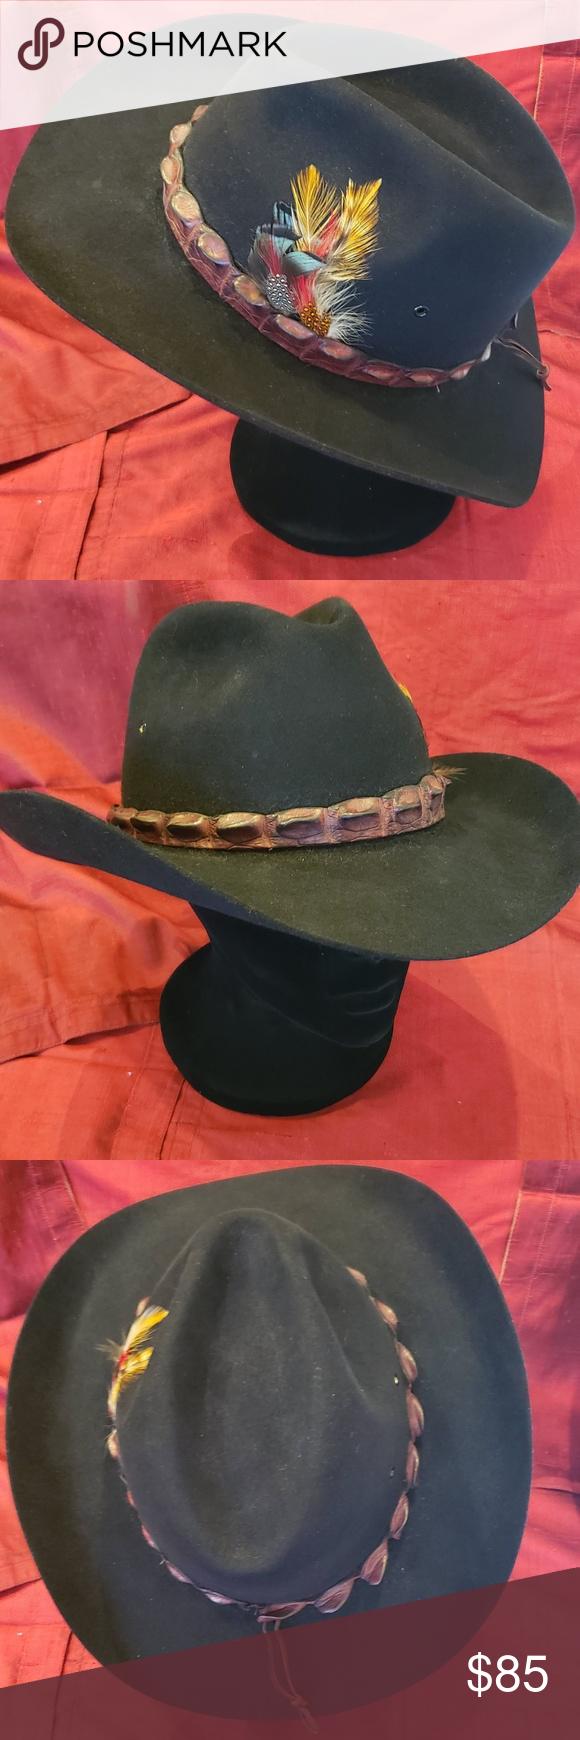 Akubra Coolabah Australian Cowboy Hat Croc Band Cowboy Hats Australian Cowboy Hat Akubra